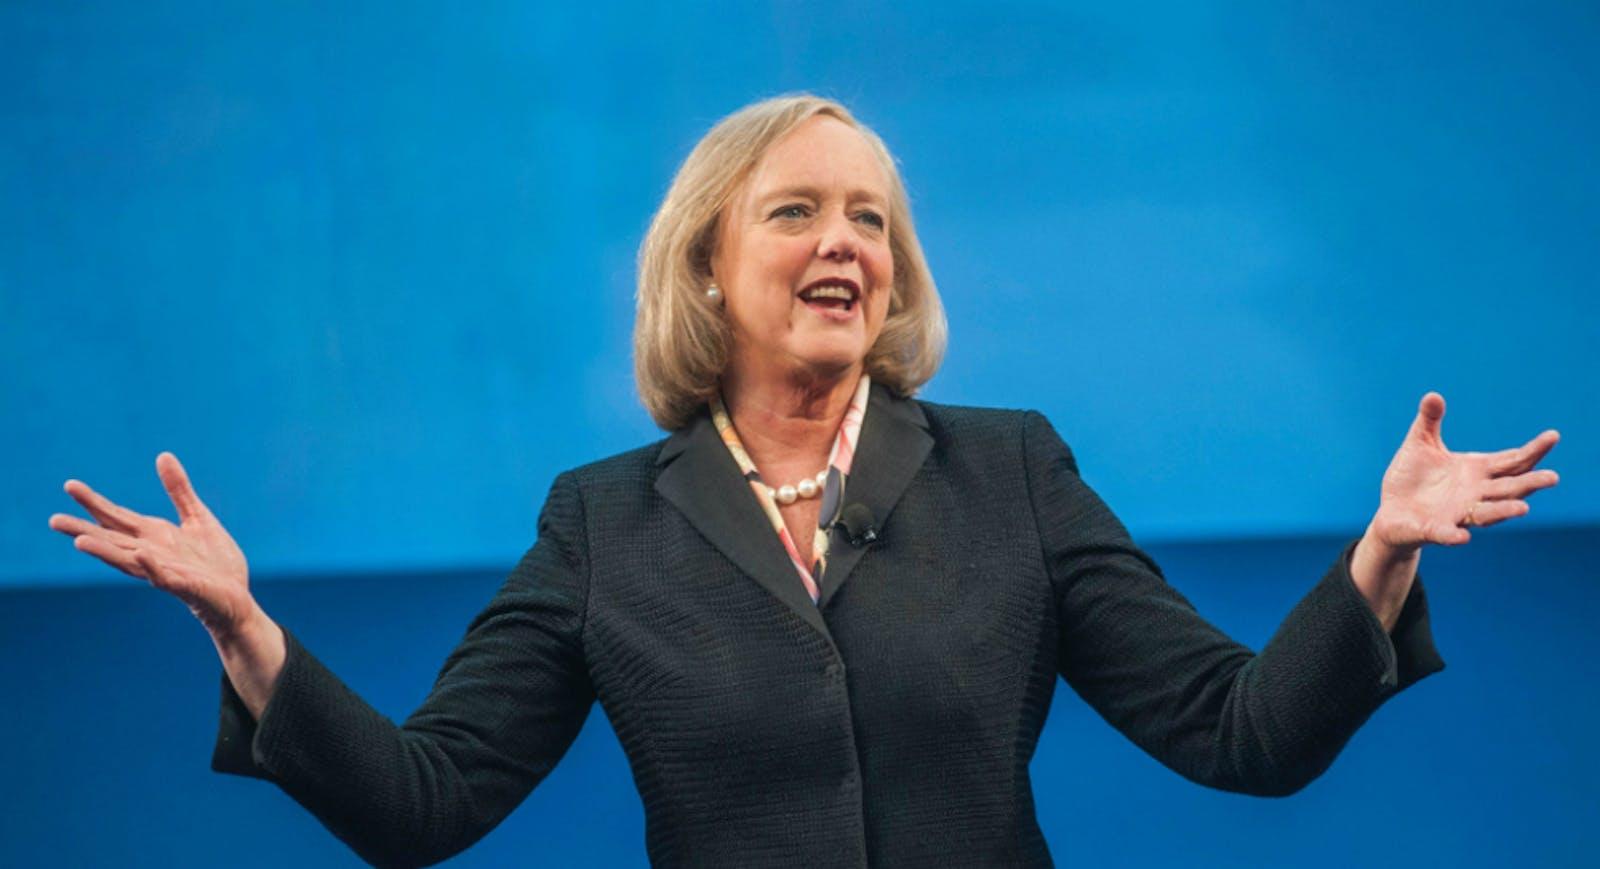 Hewlett-Packard CEO Meg Whitman. Photo by Bloomberg.